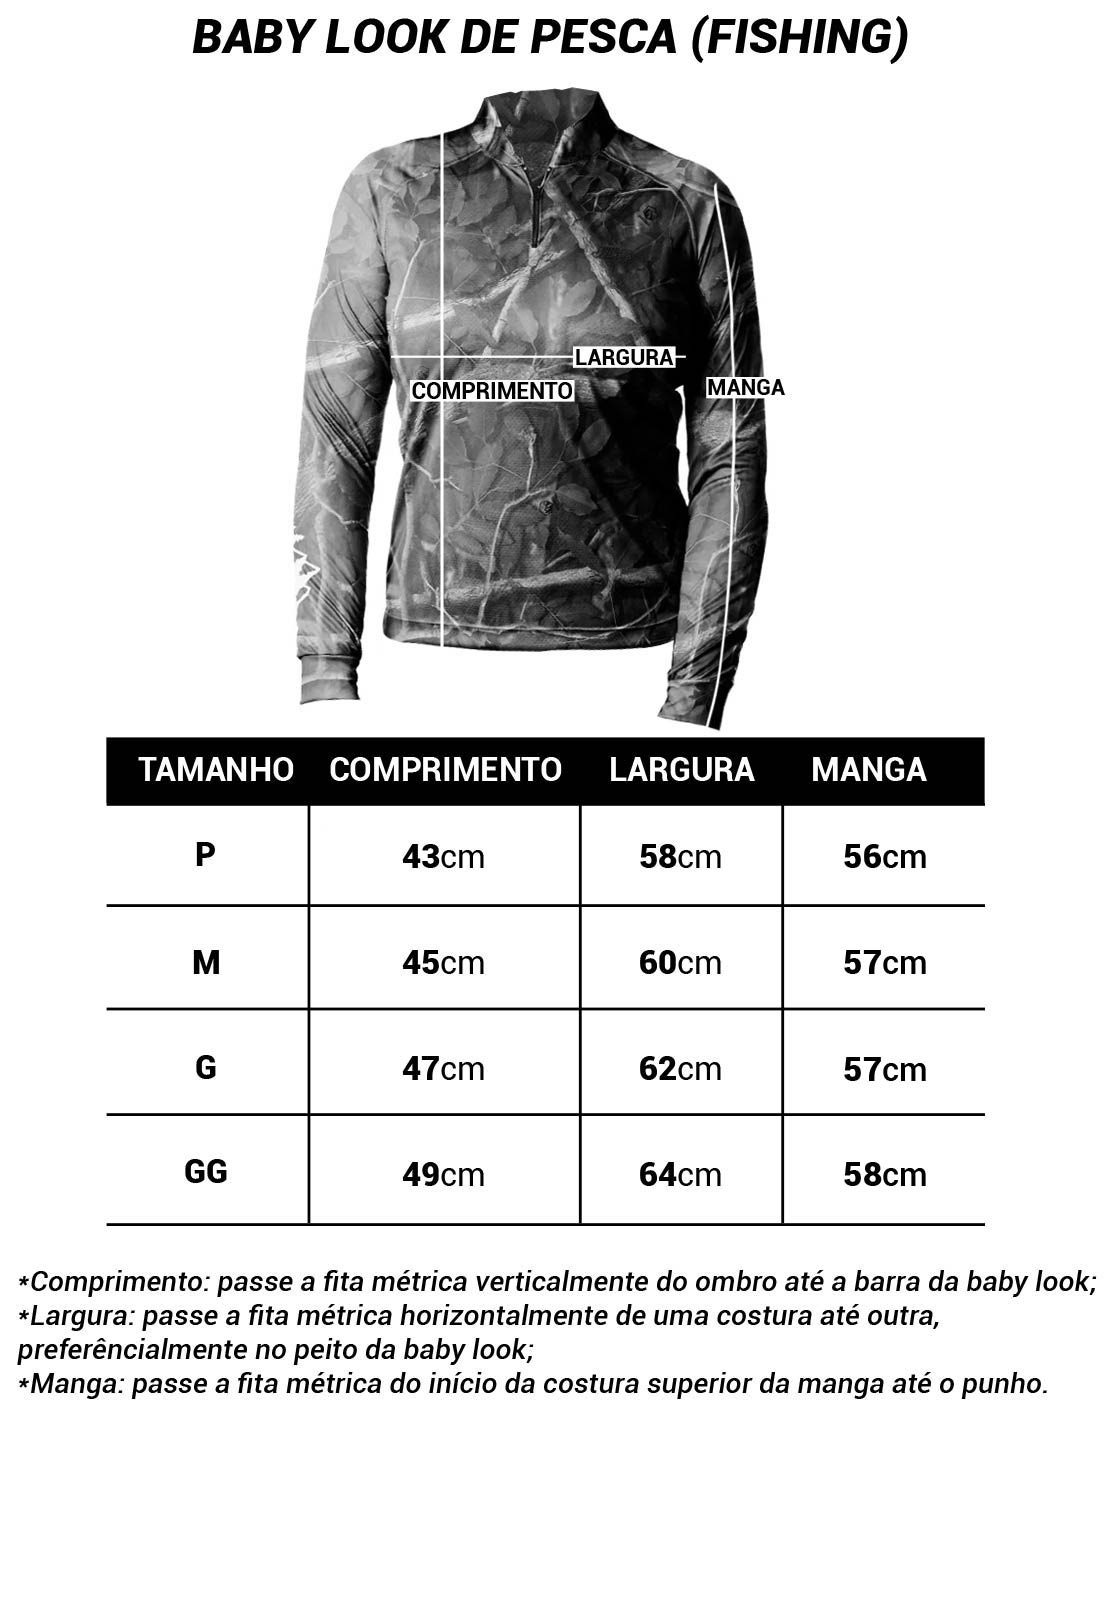 CAMISA DE PESCA FISH TECH PRO 10 FEMININA + BANDANA GRÁTIS  - REAL HUNTER OUTDOORS